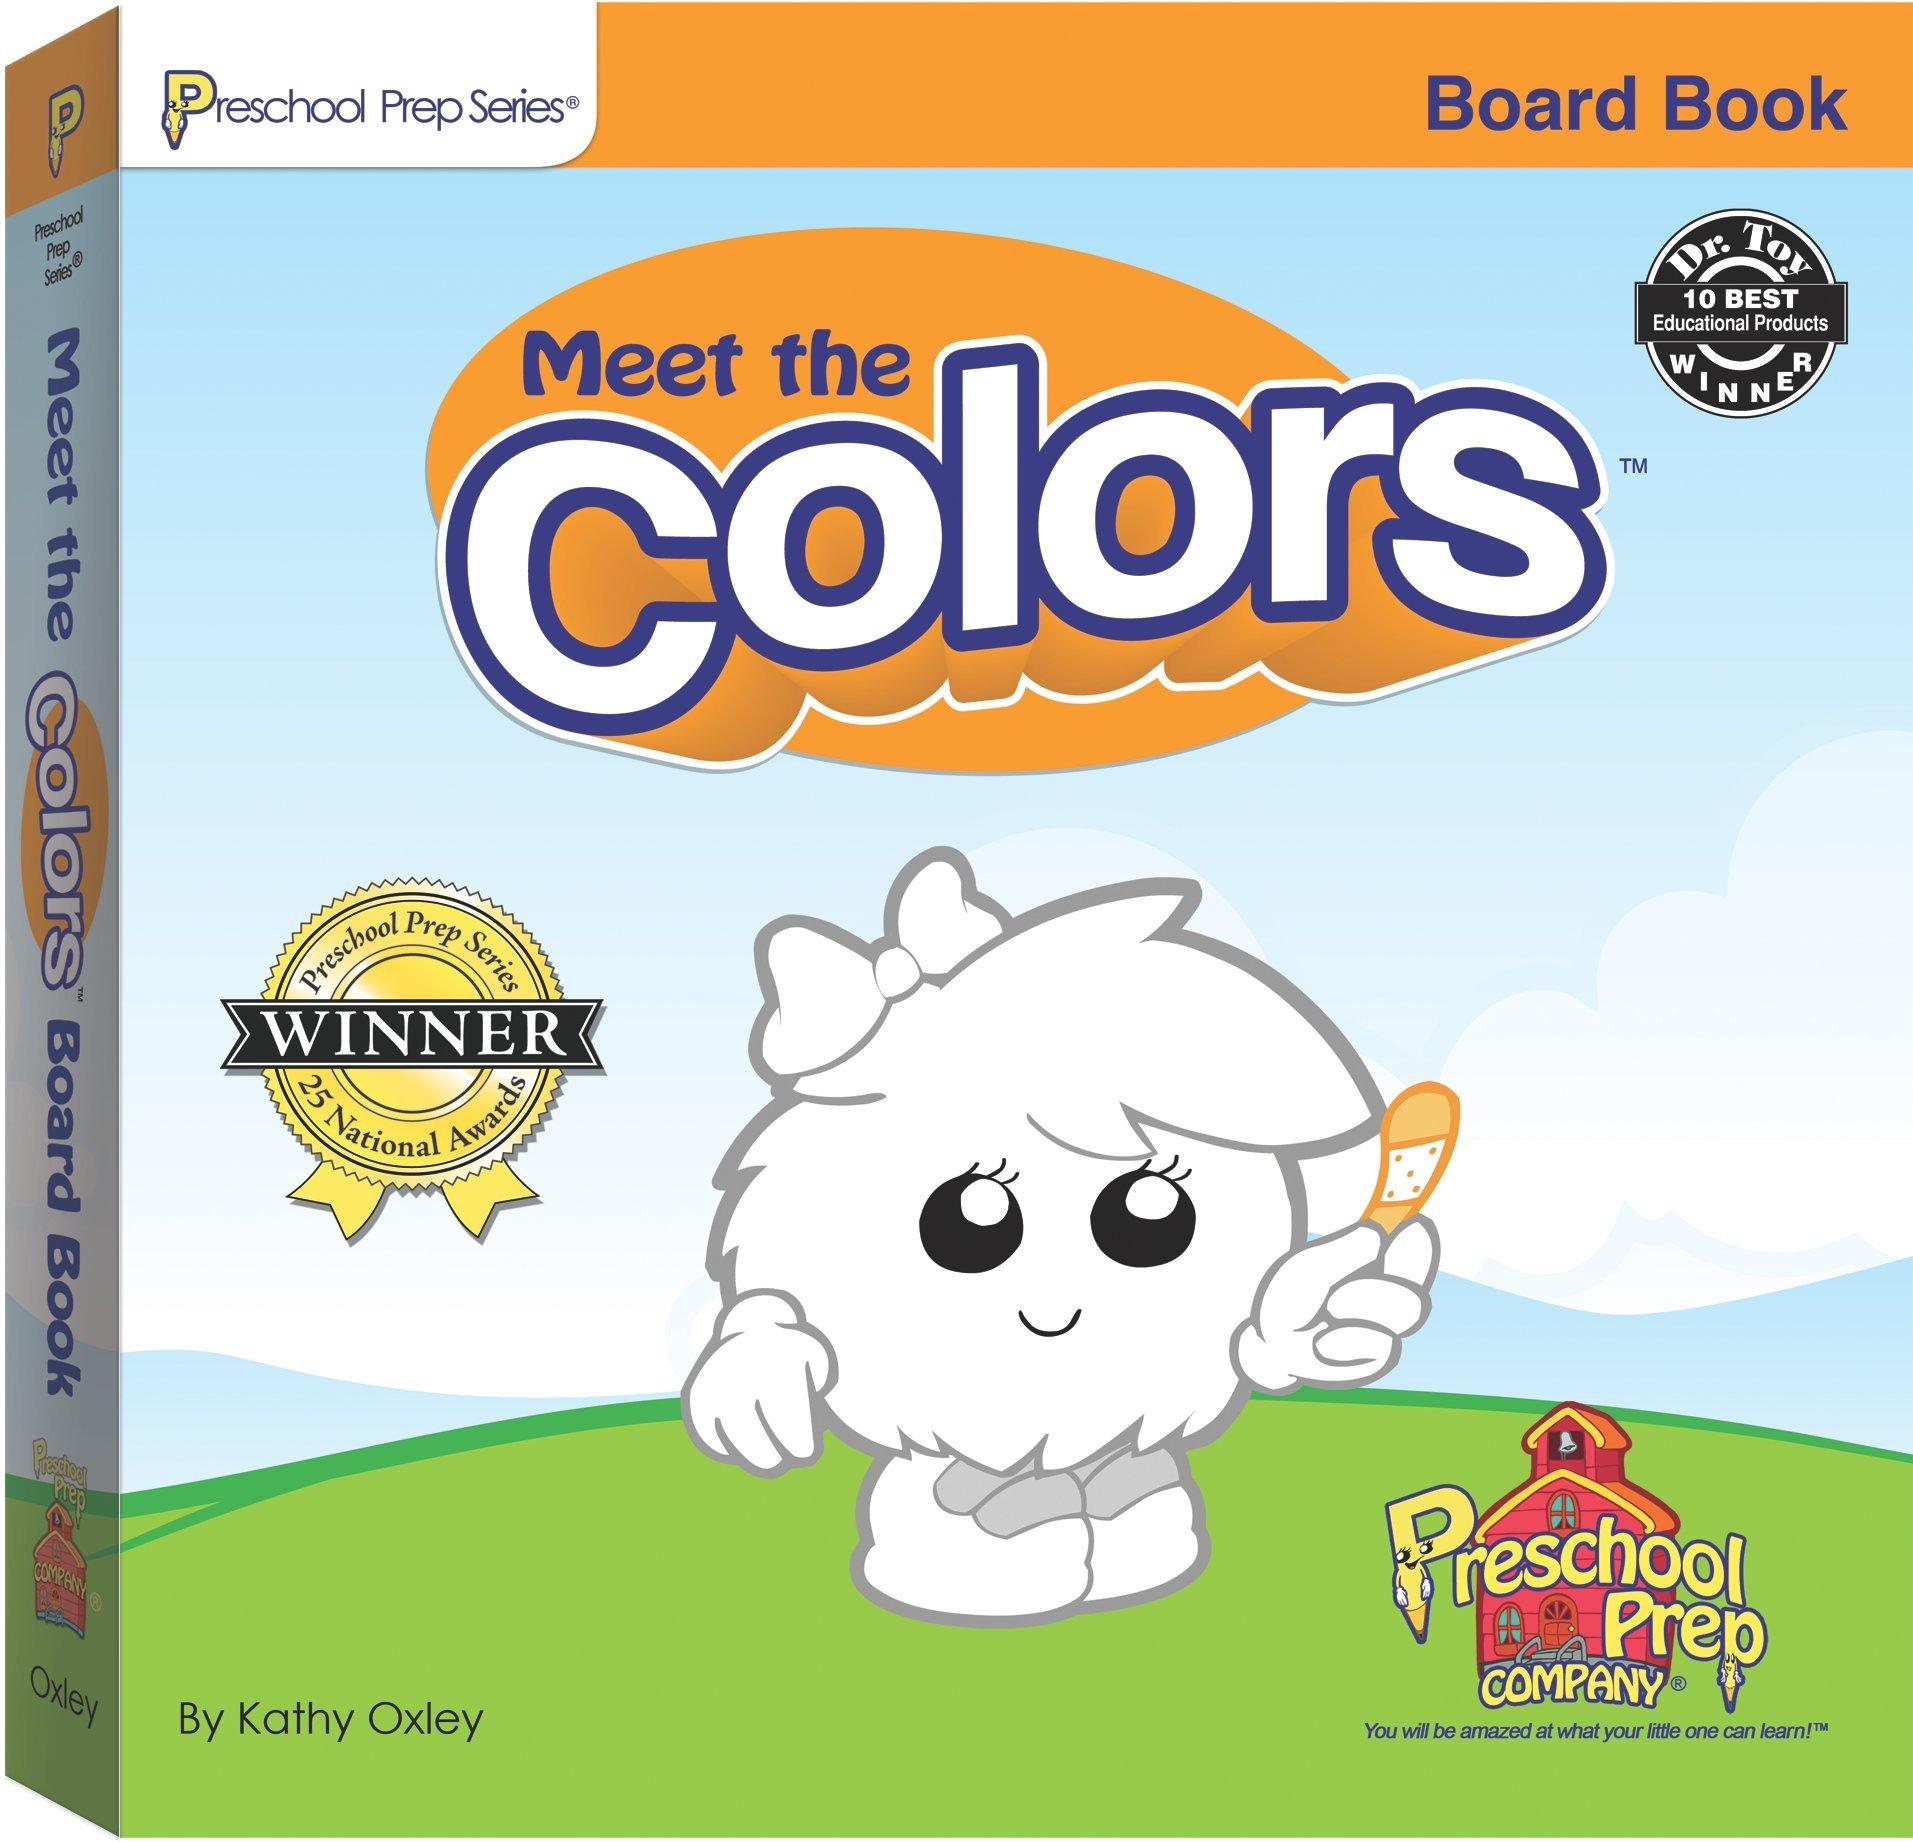 Meet the Colors Board Book Kathy Oxley Sherwin Rosario